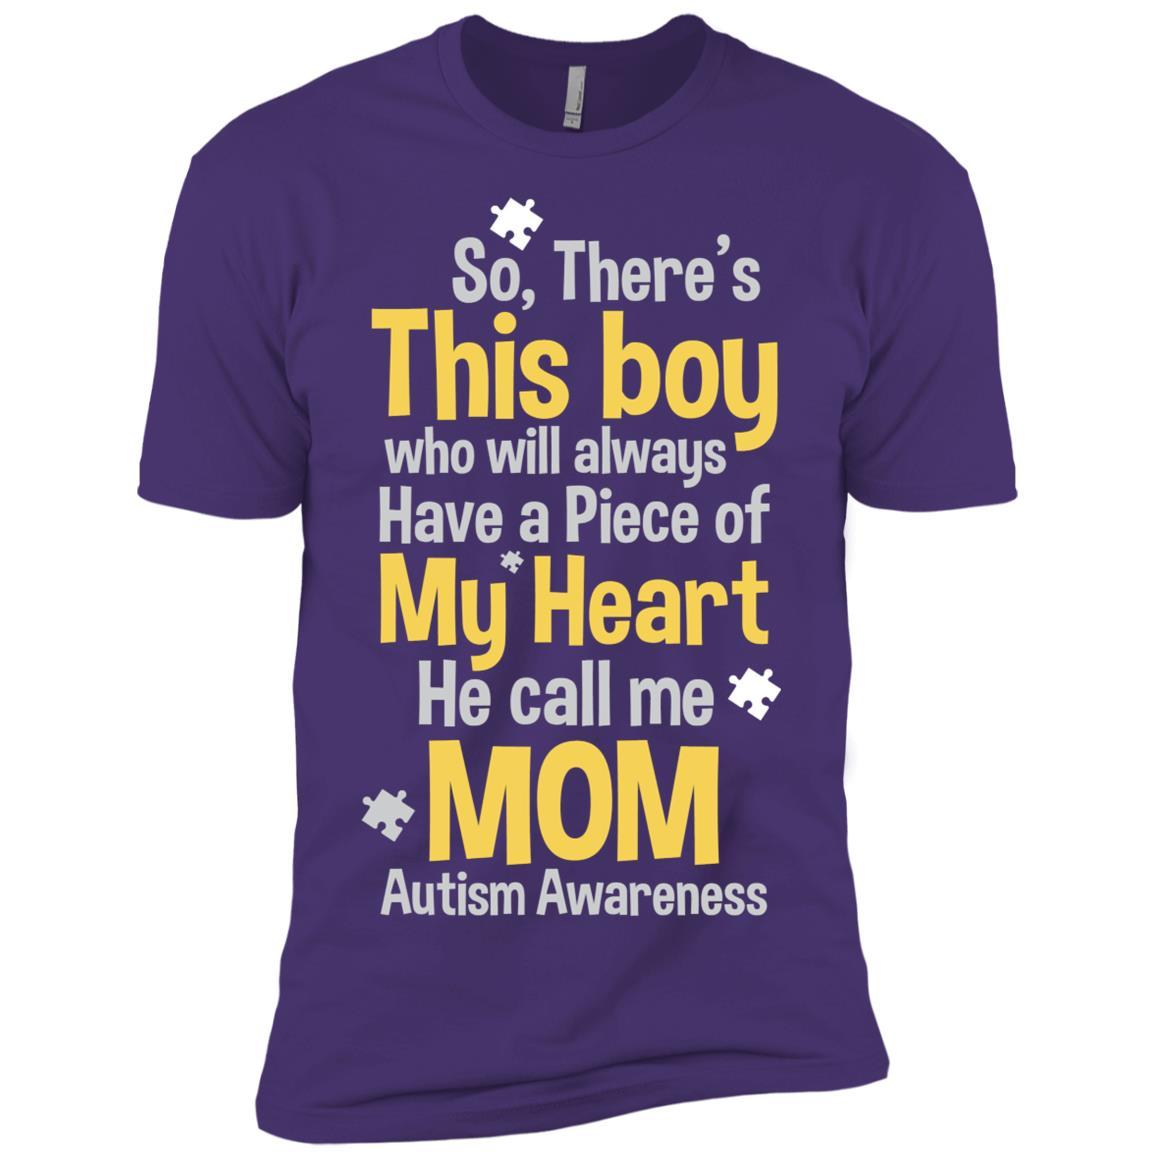 My Heart He call me Mom Autism Awareness Men Short Sleeve T-Shirt